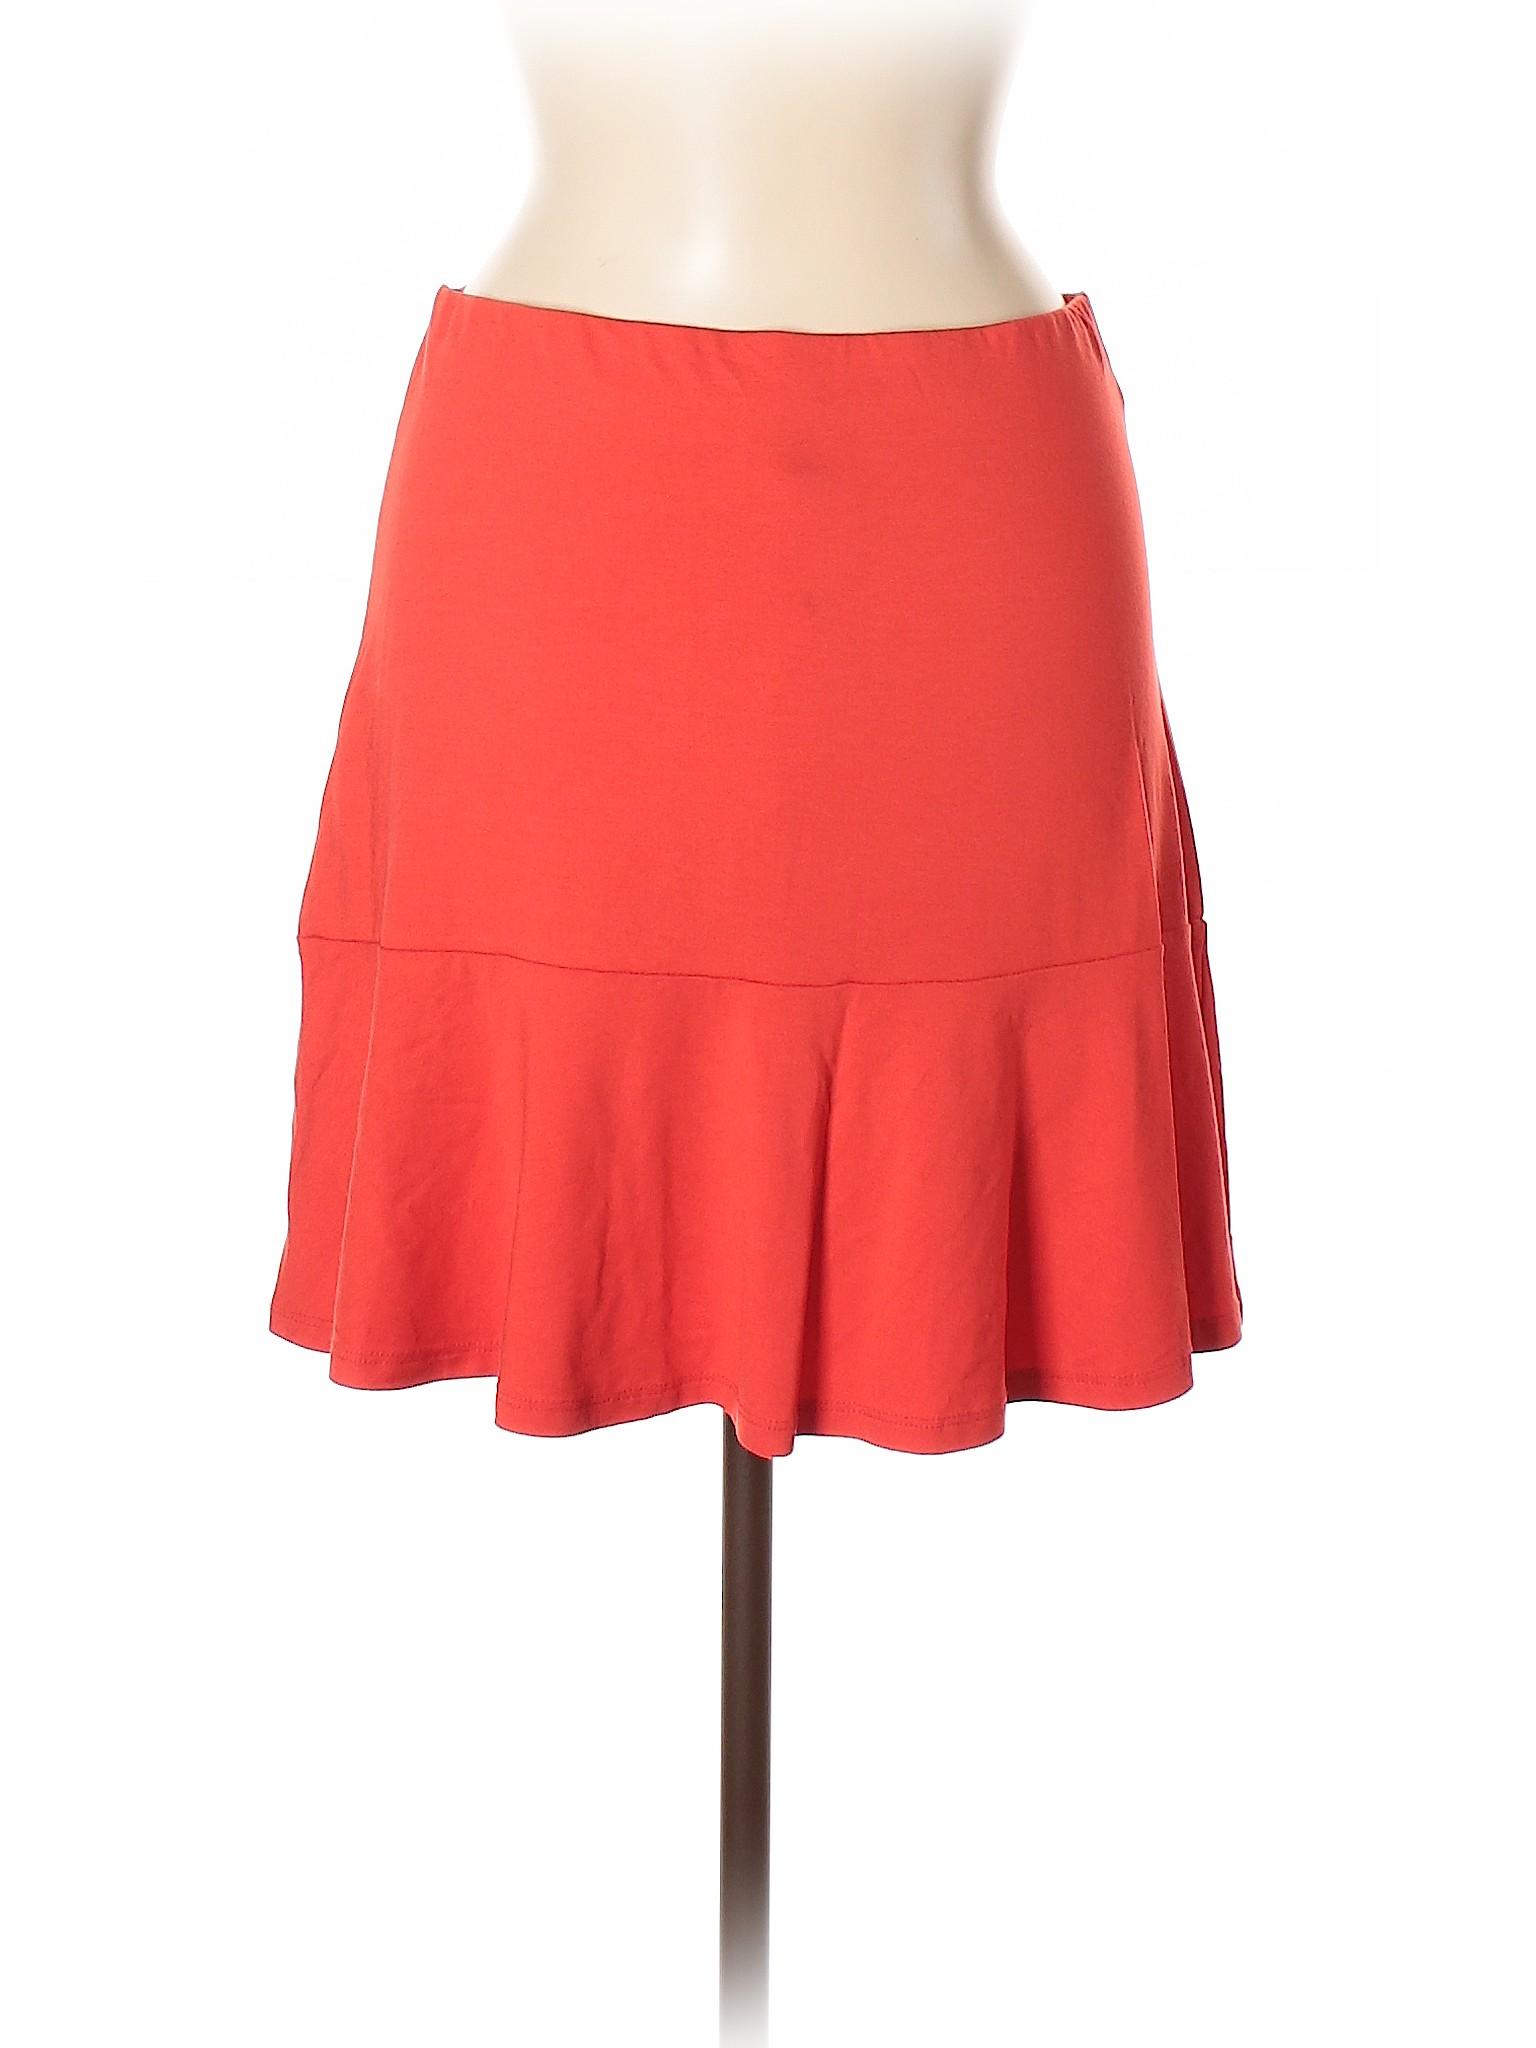 Skirt Boutique Boutique Casual Boutique Skirt Casual 7pxTXqwUPT